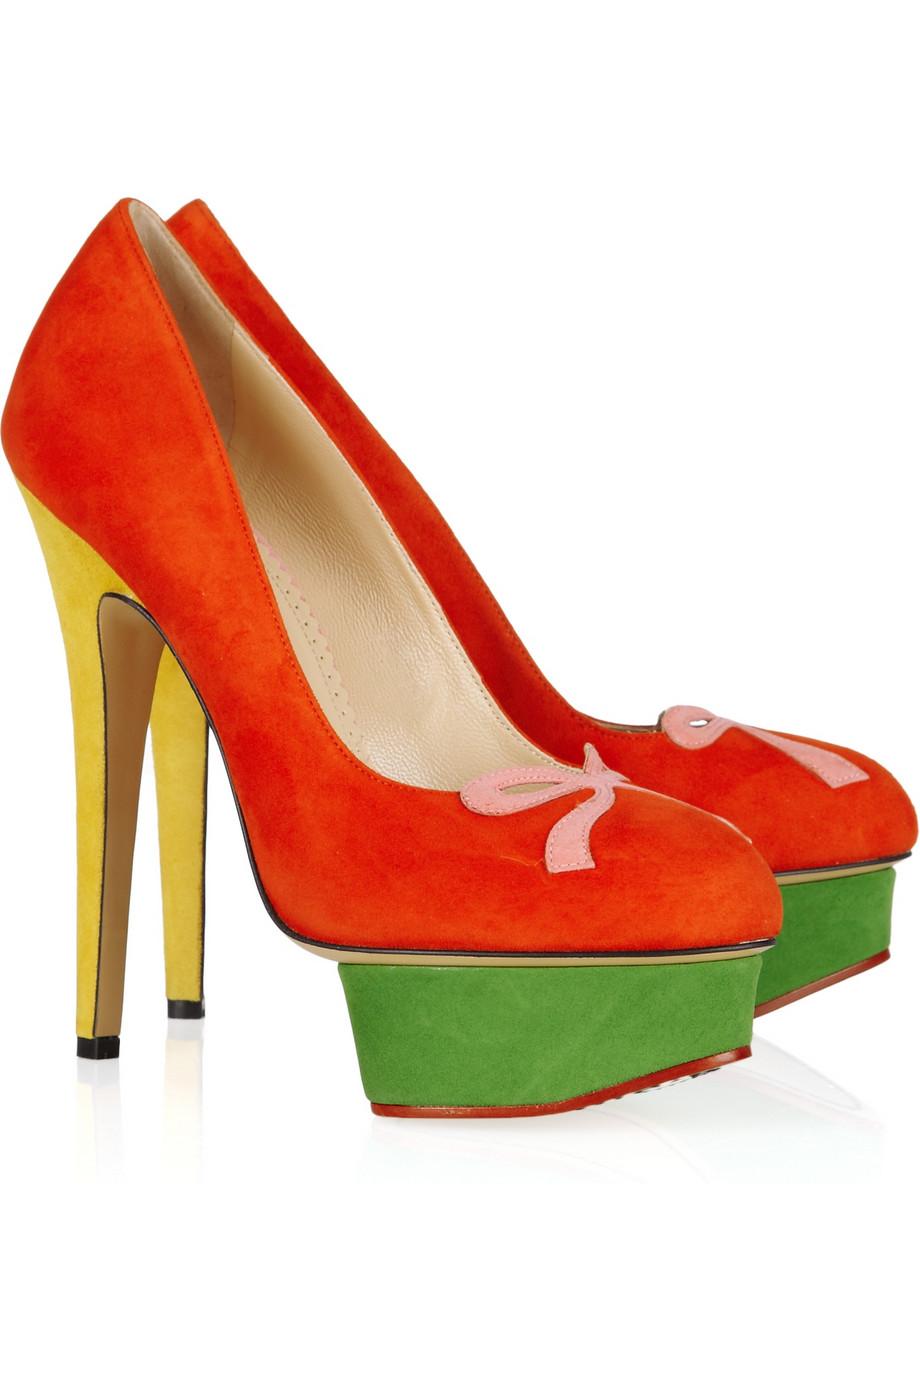 Charlotte Olympia Arabella Colorblock Suede Platform Pumps In Red Lyst Womens Pu Sweet High Heels Shoes Gallery